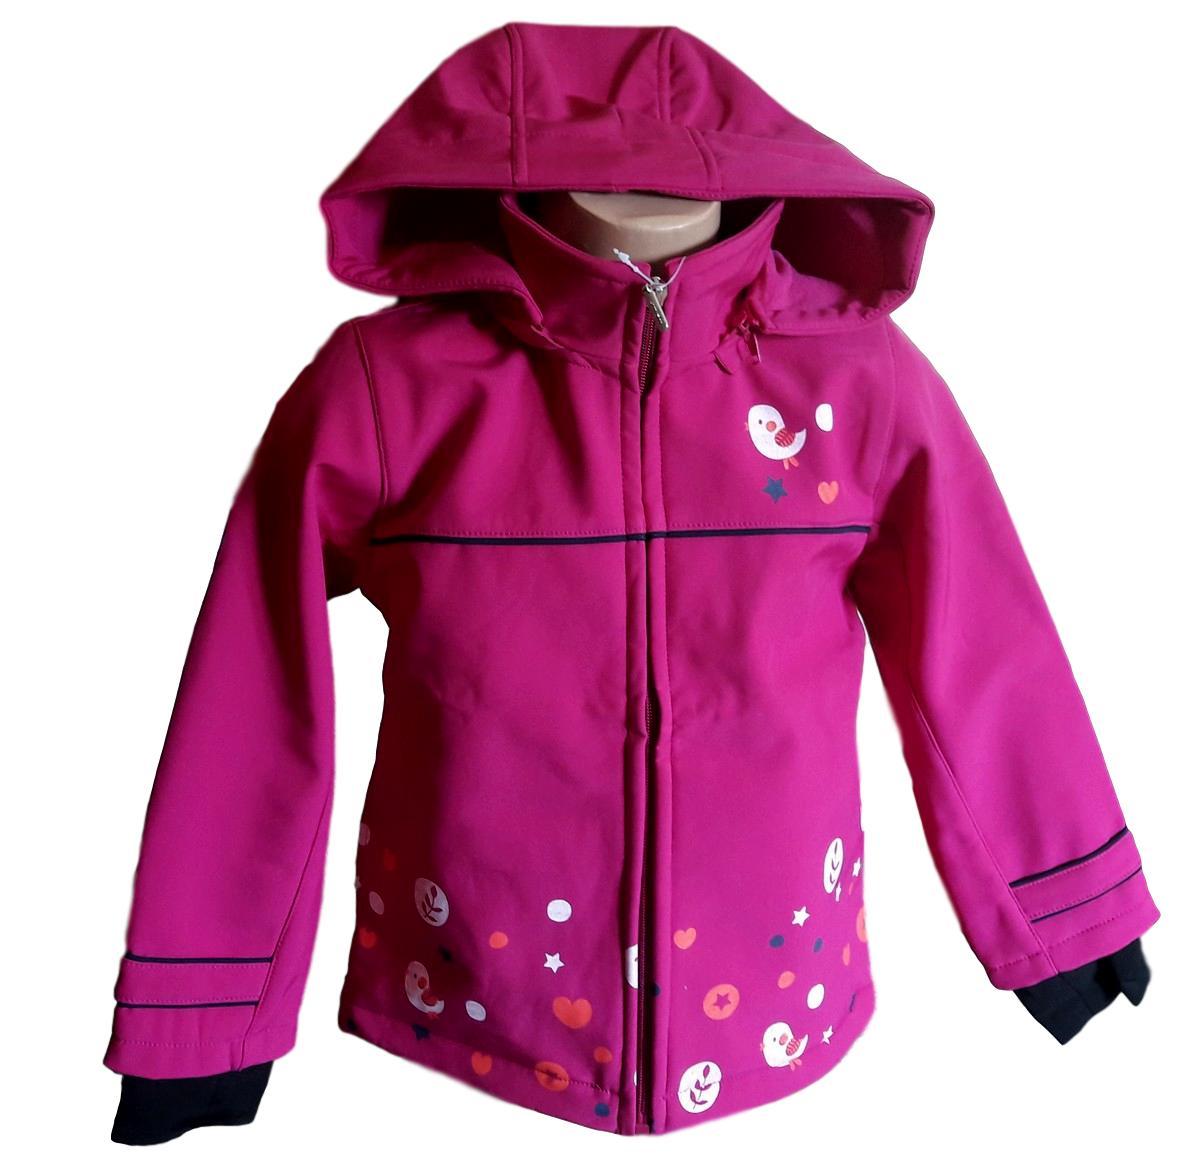 340d9e5a6c2 Dívčí softshellová bunda Wolf vel. 98 104 tm. růžová